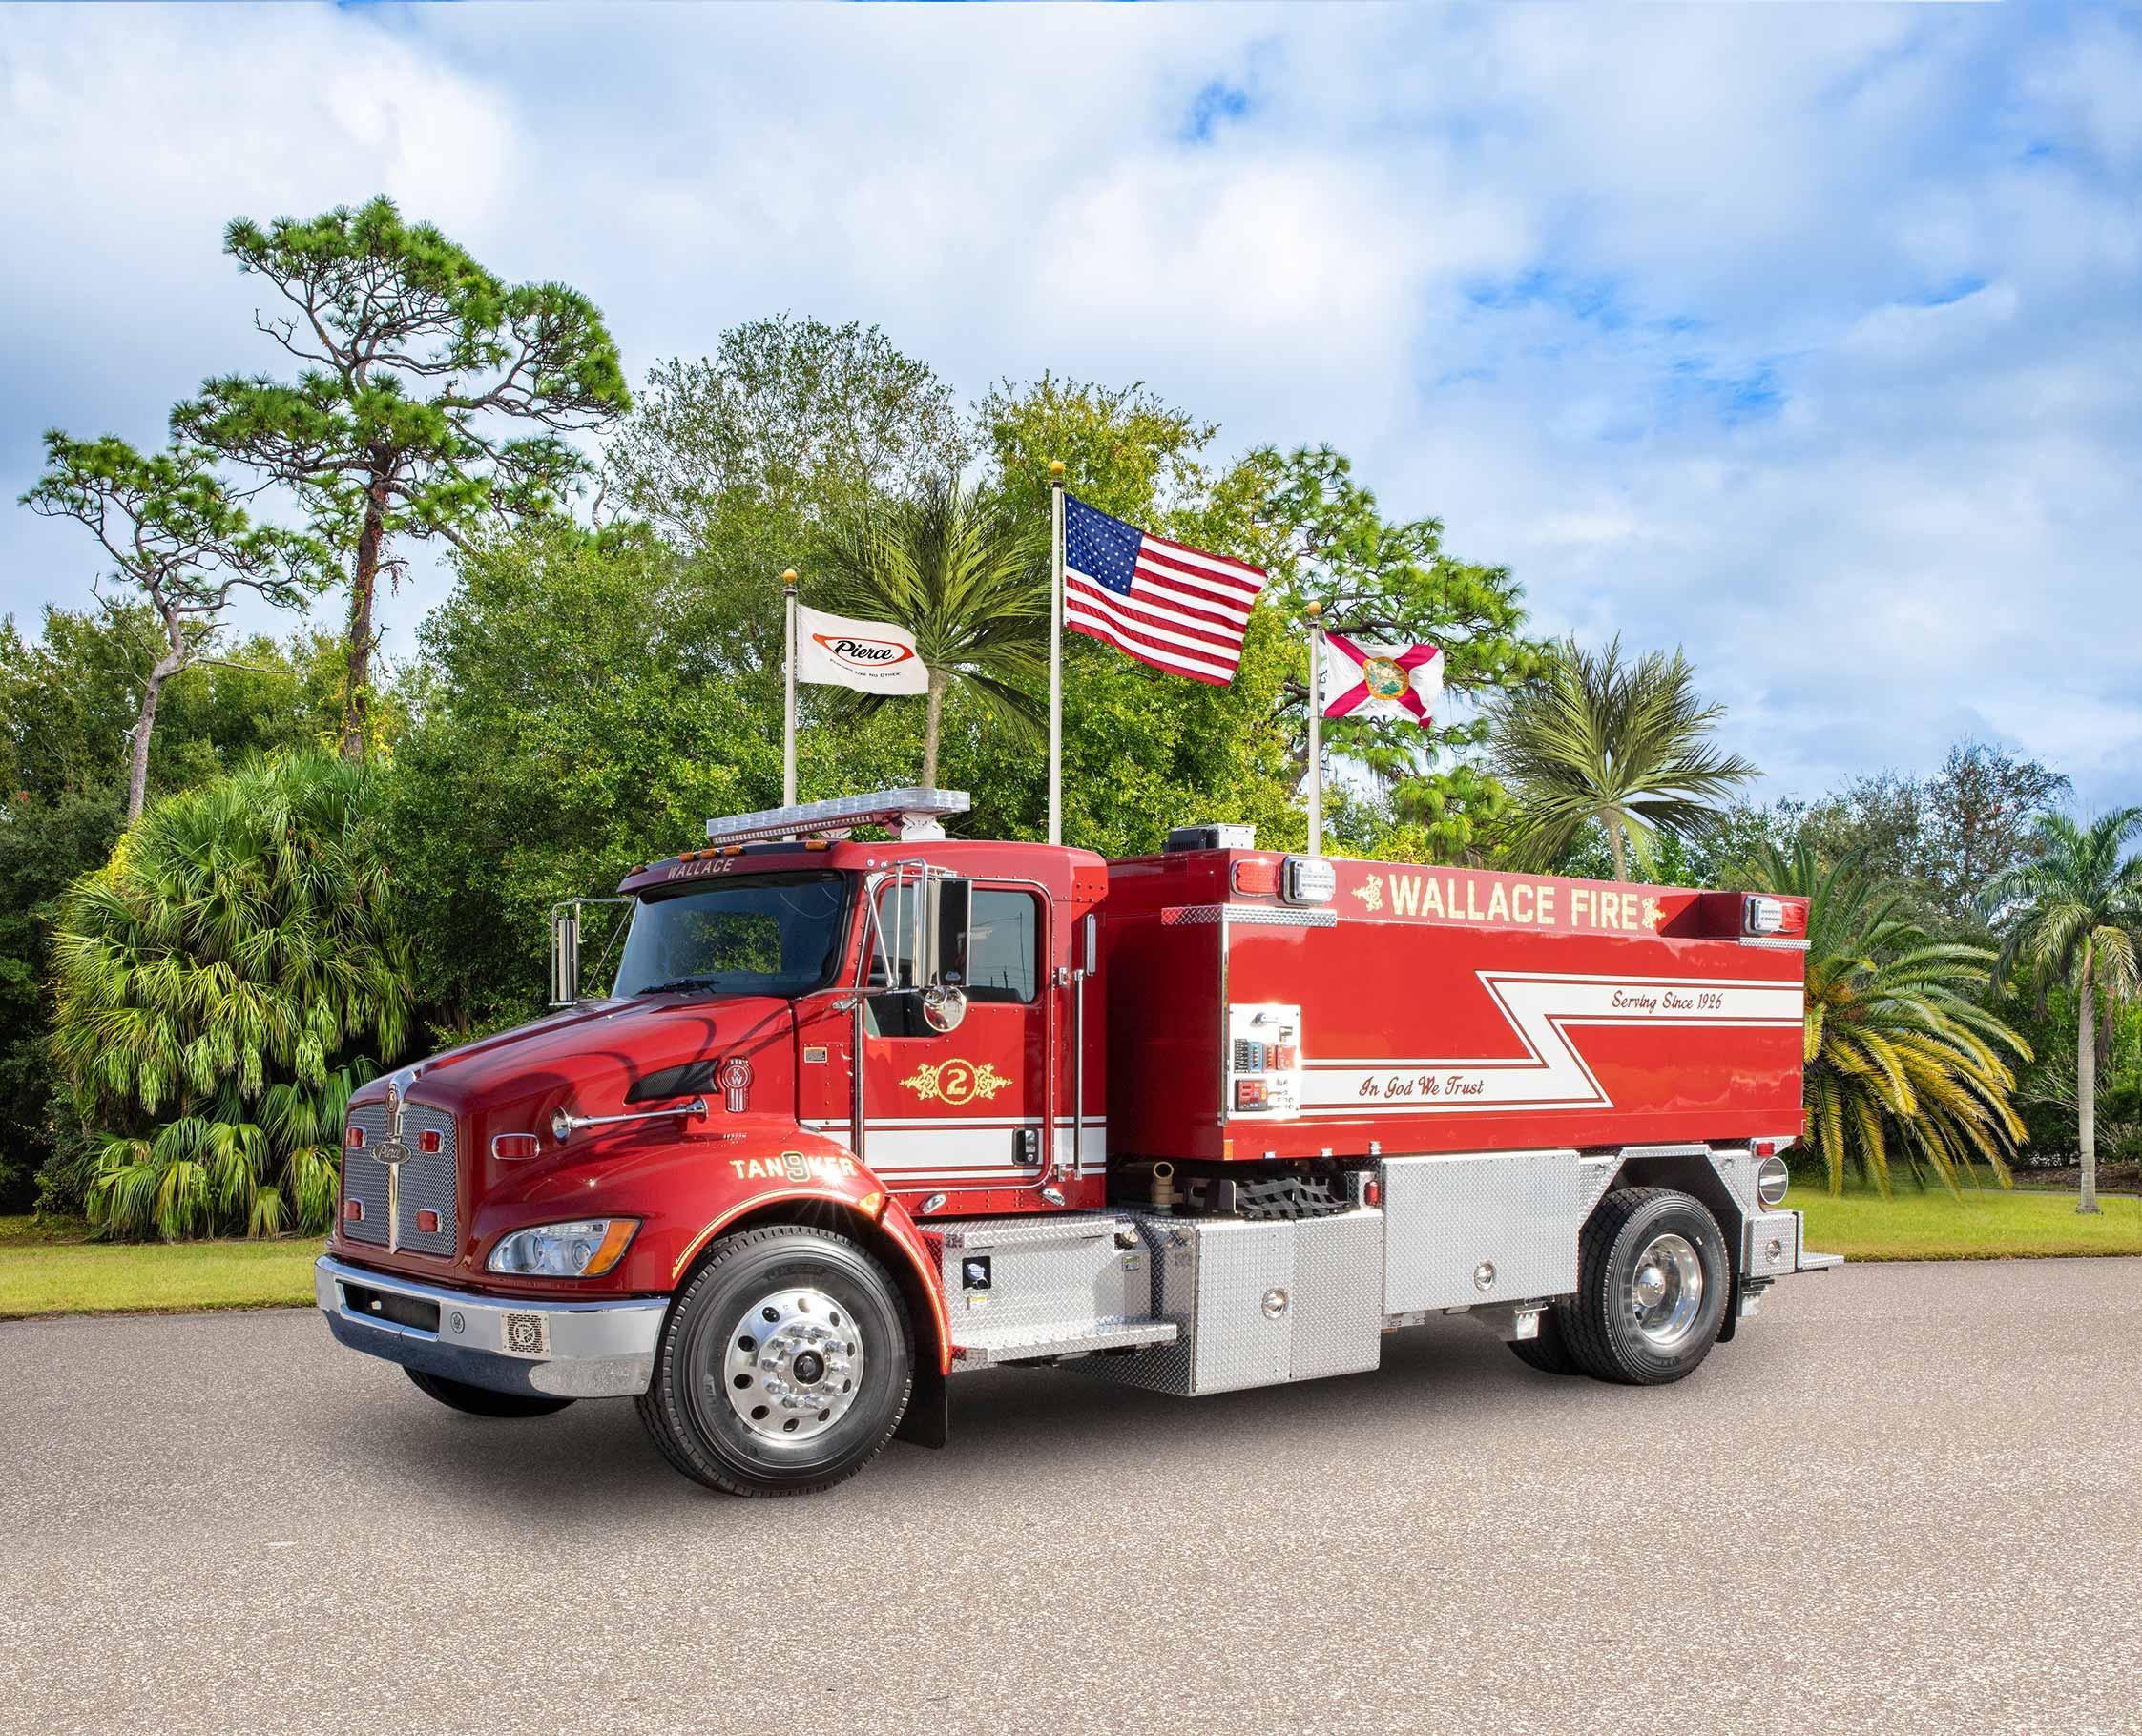 Wallace Fire Department - Tanker